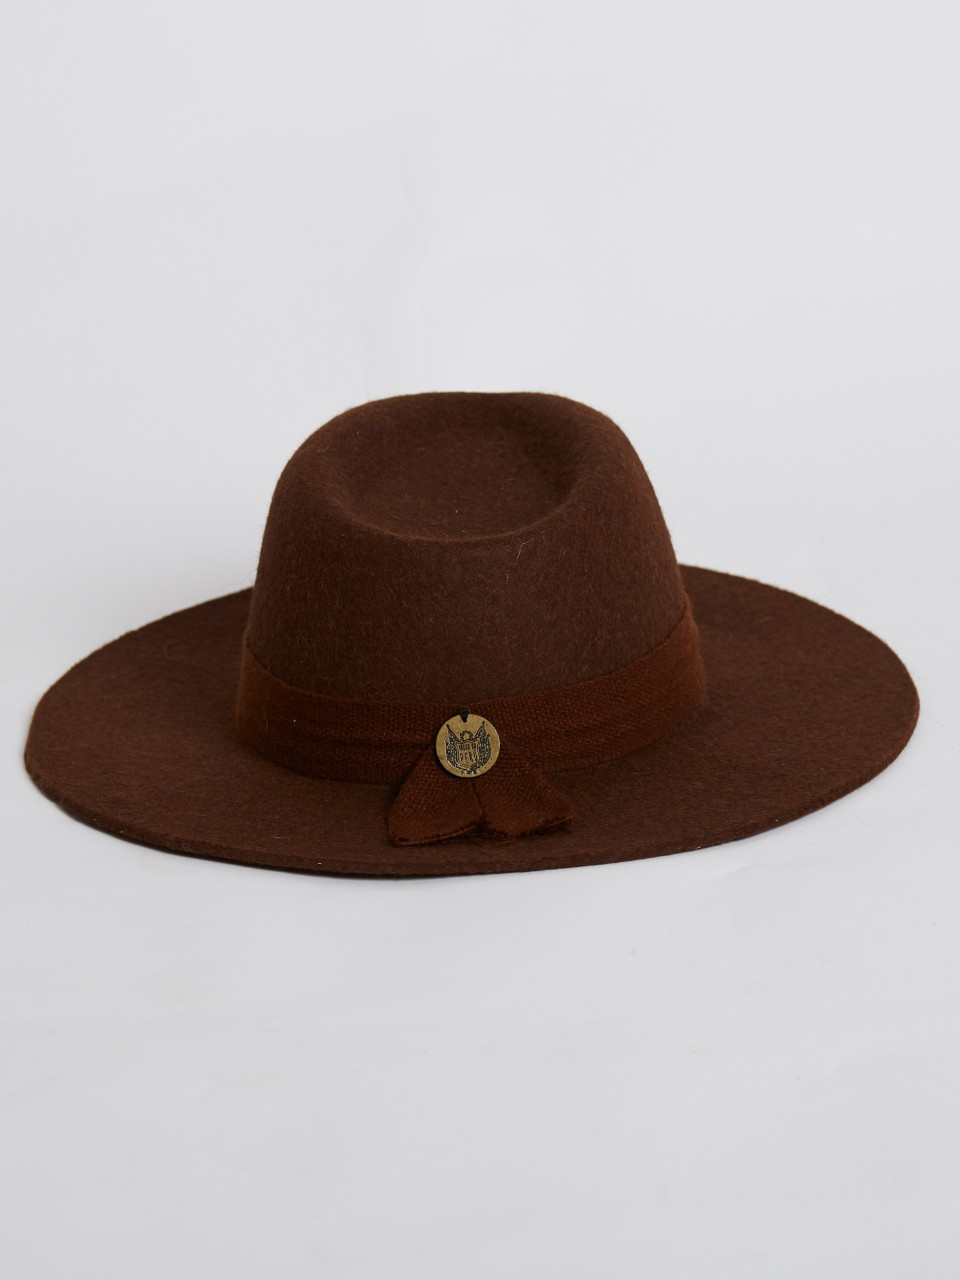 Cusco brown 1